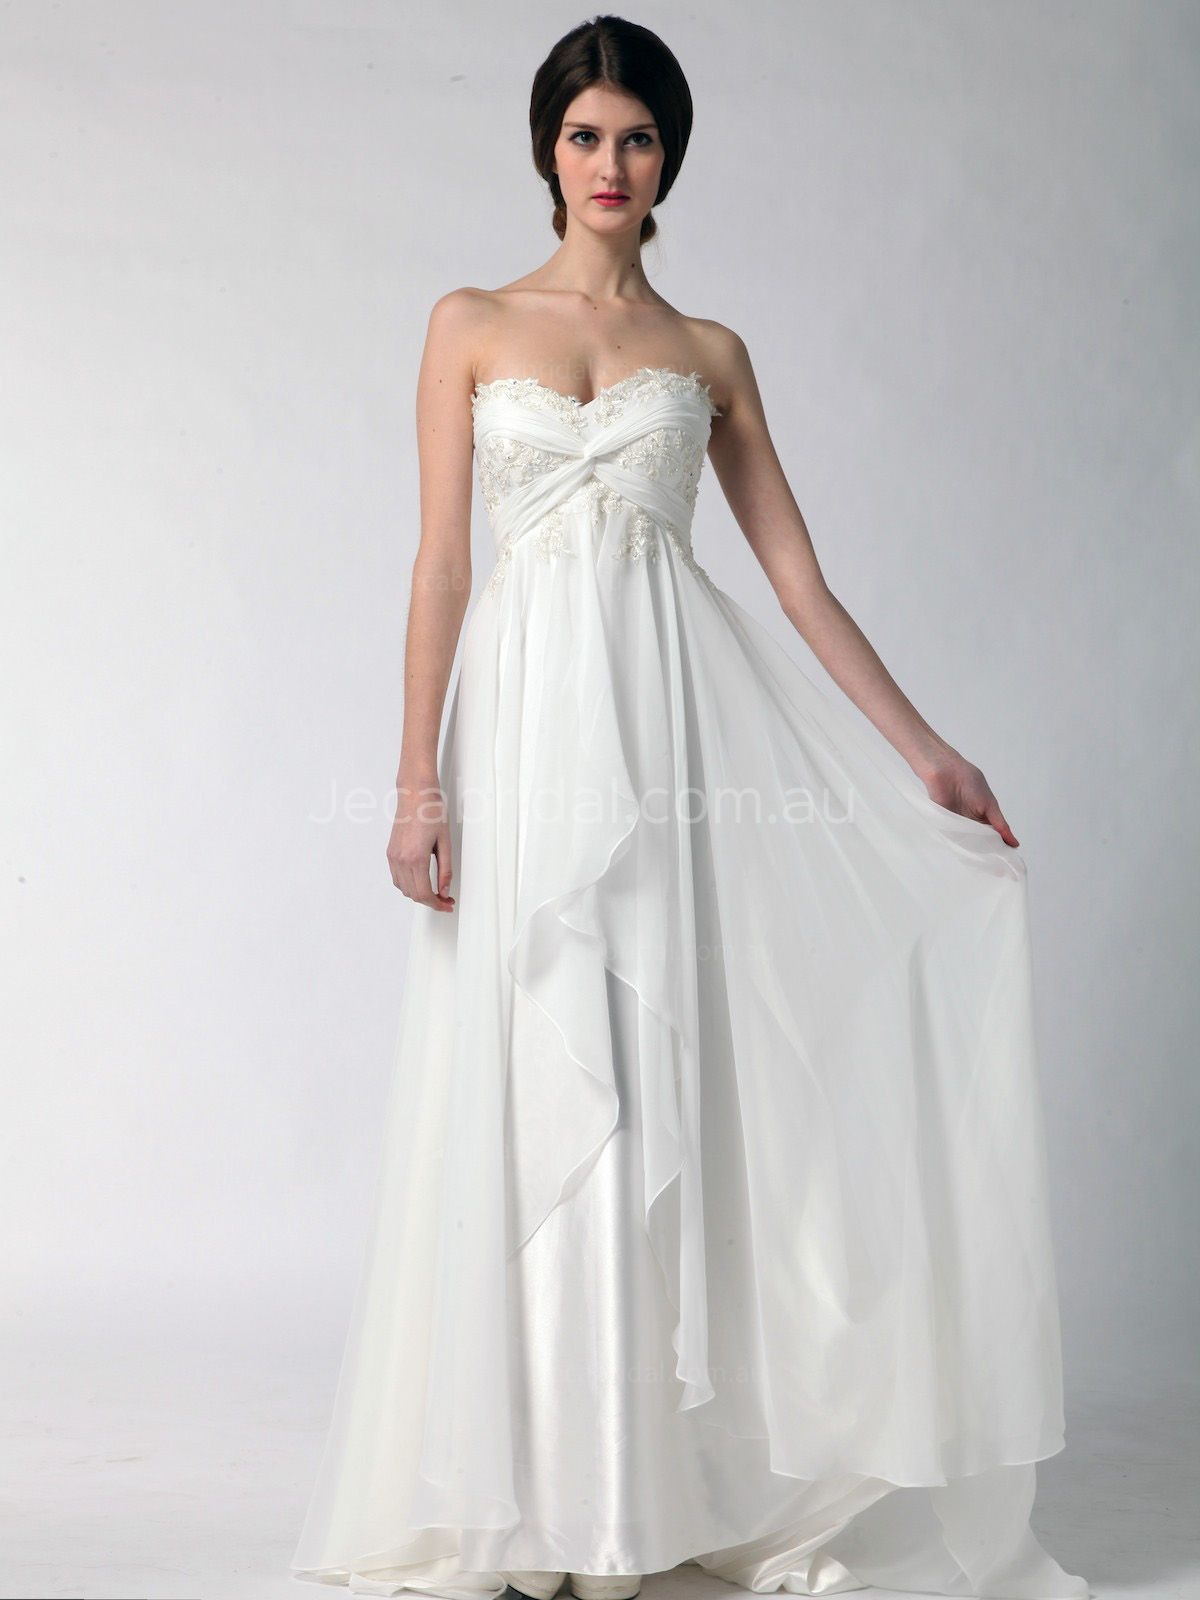 goddess wedding dresses photo - 1